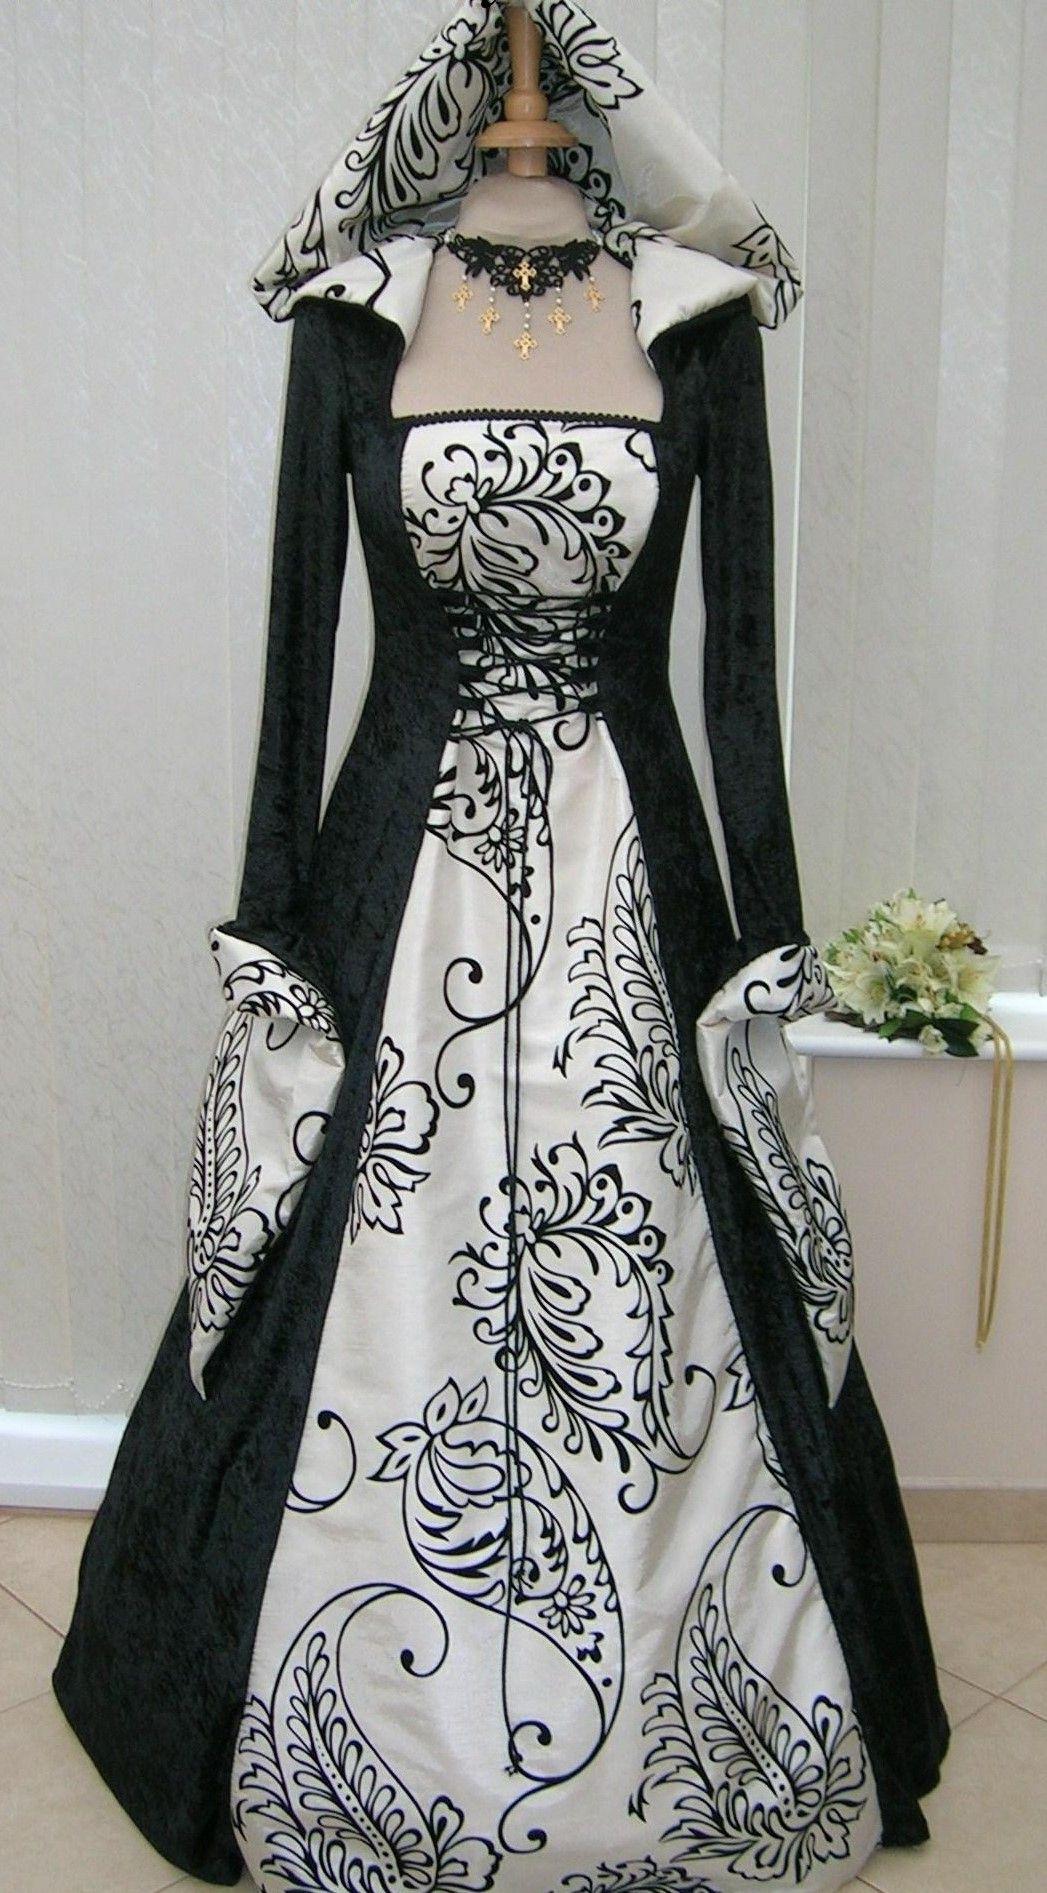 Handfasting Medieval Hooded Wedding Dress Black & Cream | Chicago ...